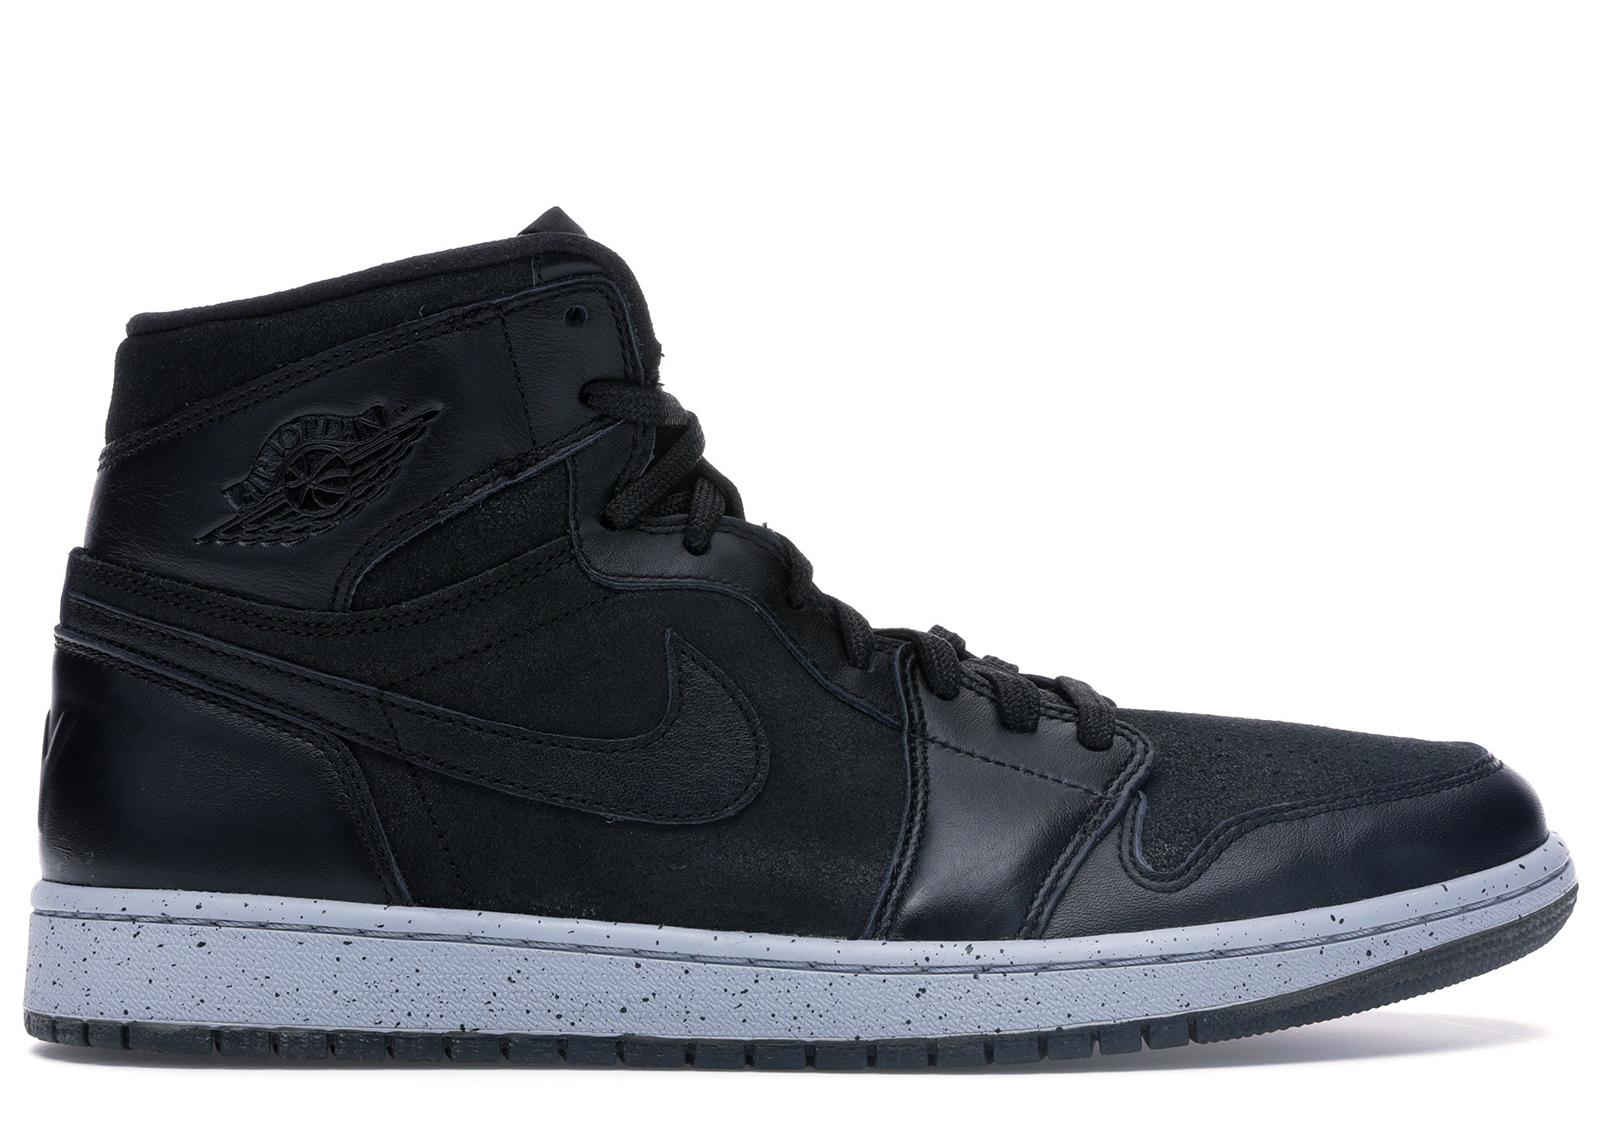 Jordan 1 Retro NYC - 715060-002